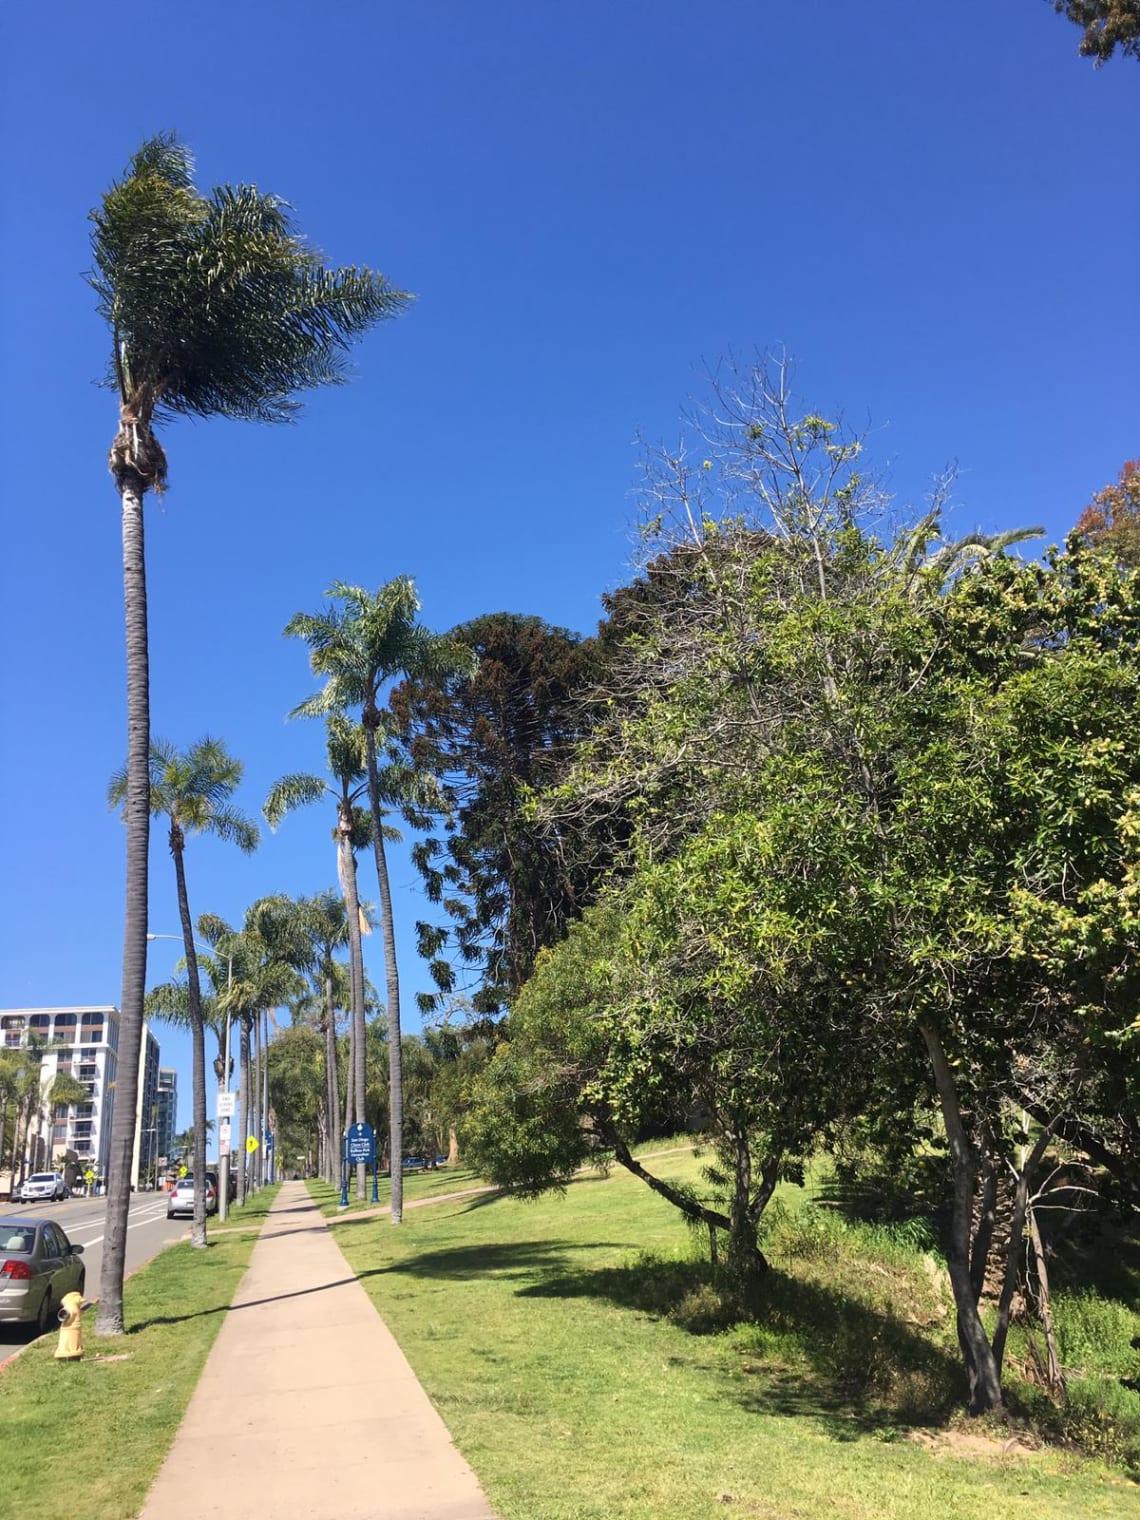 Lugares imperdibles que visitar en San Diego, California - Worldpackers - balboa park en san diego